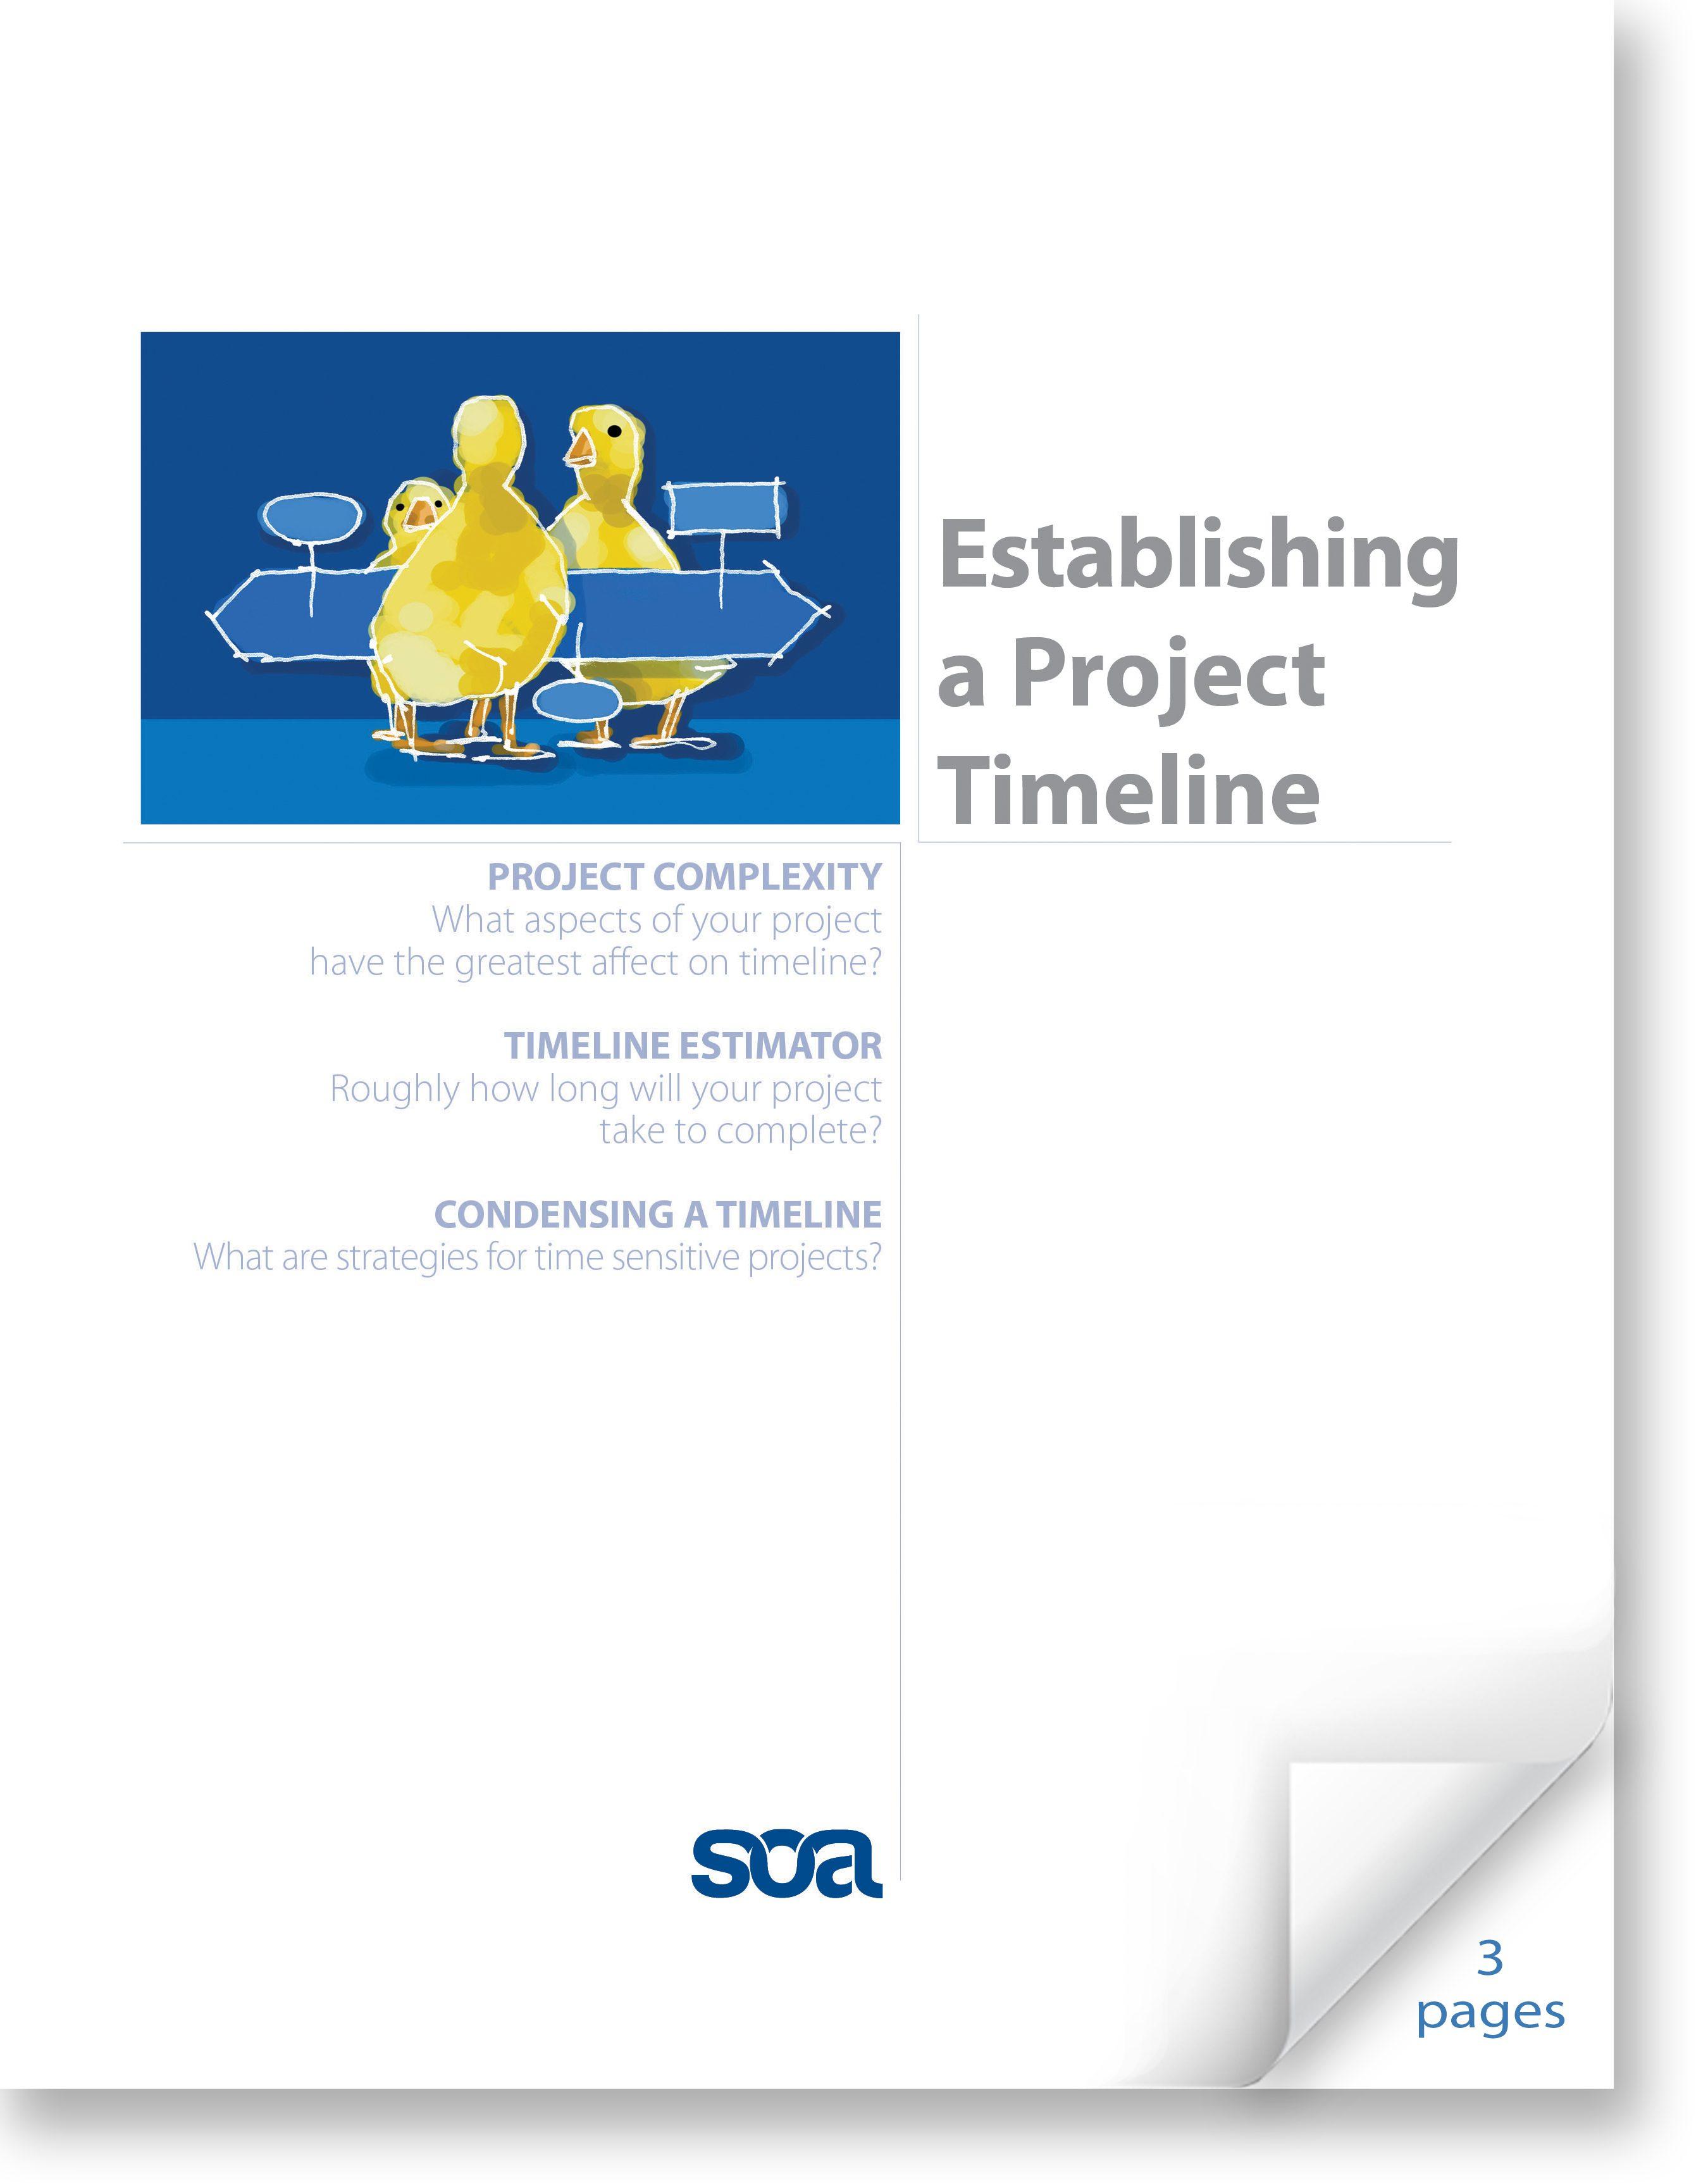 Establishing a Project Timeline Screenshot